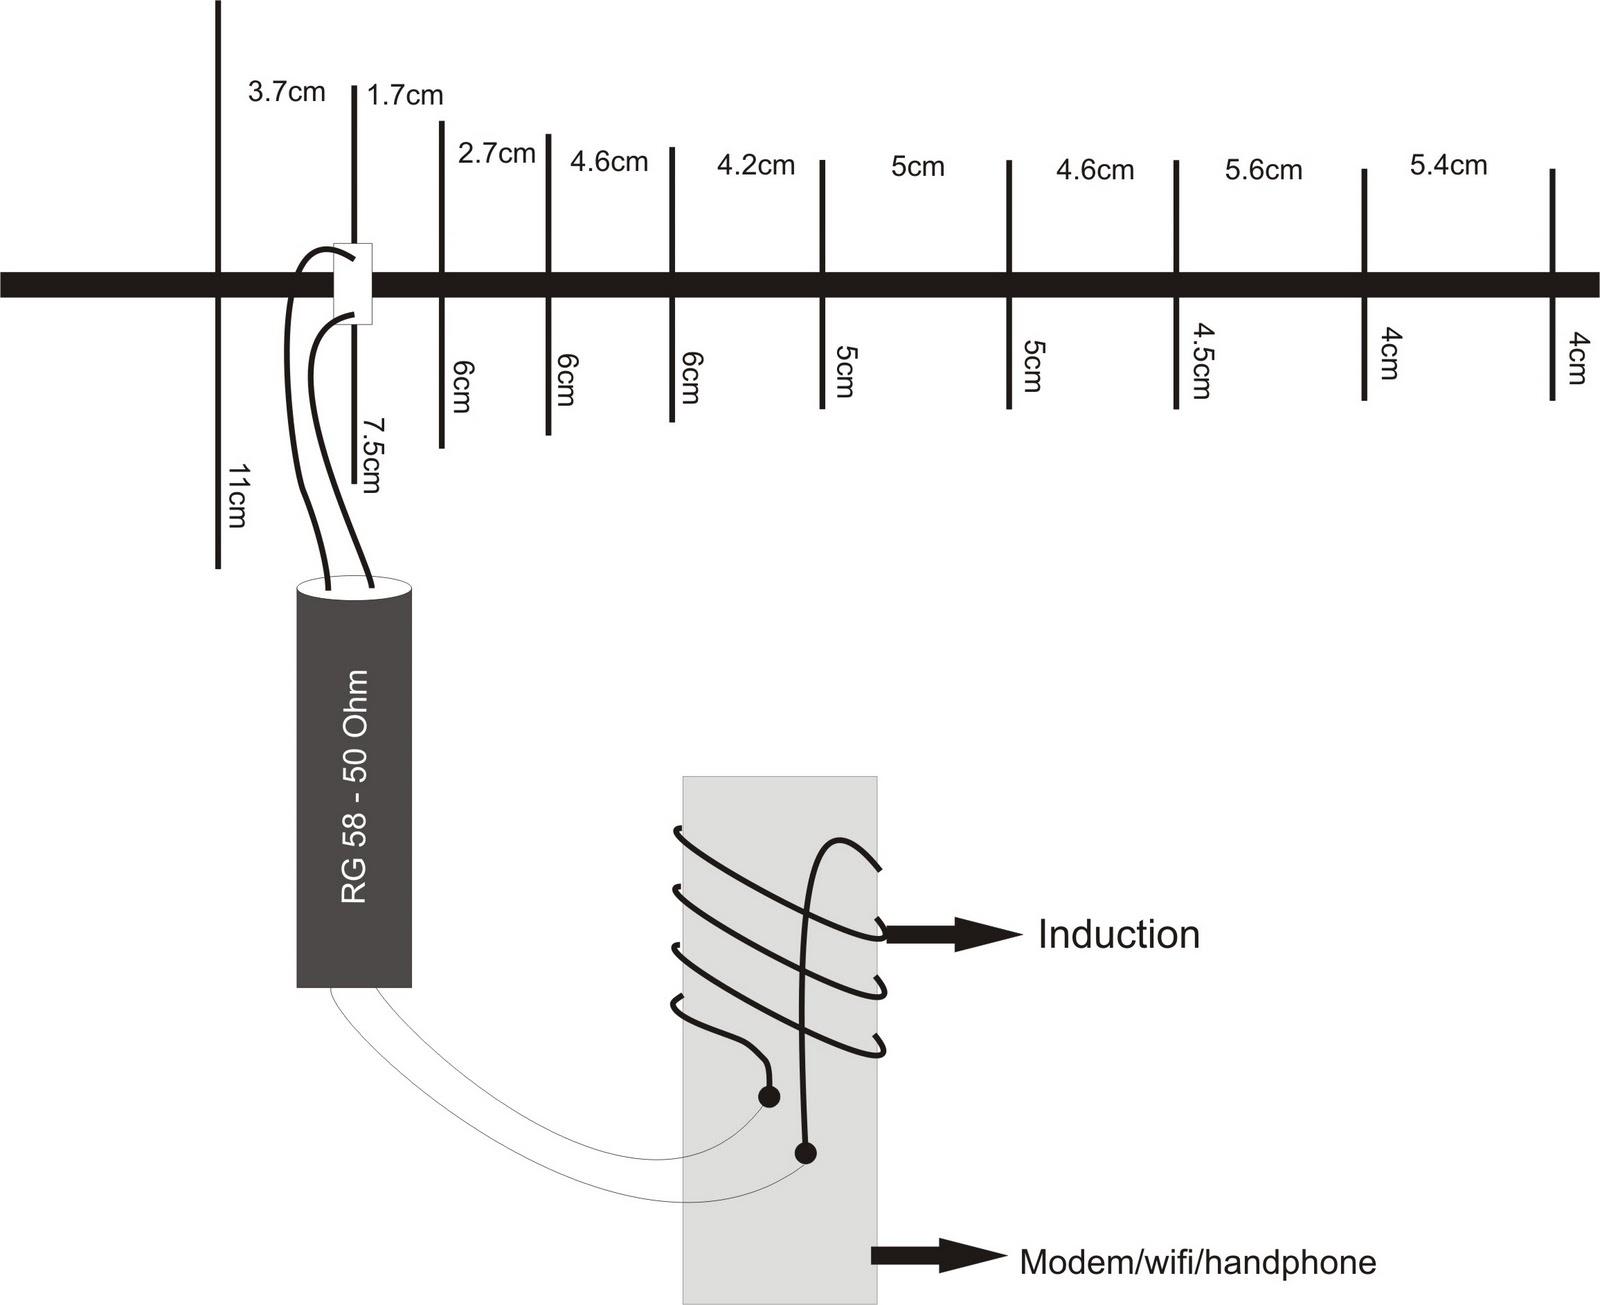 Yagi Antena For Cdma Modem Informatic System